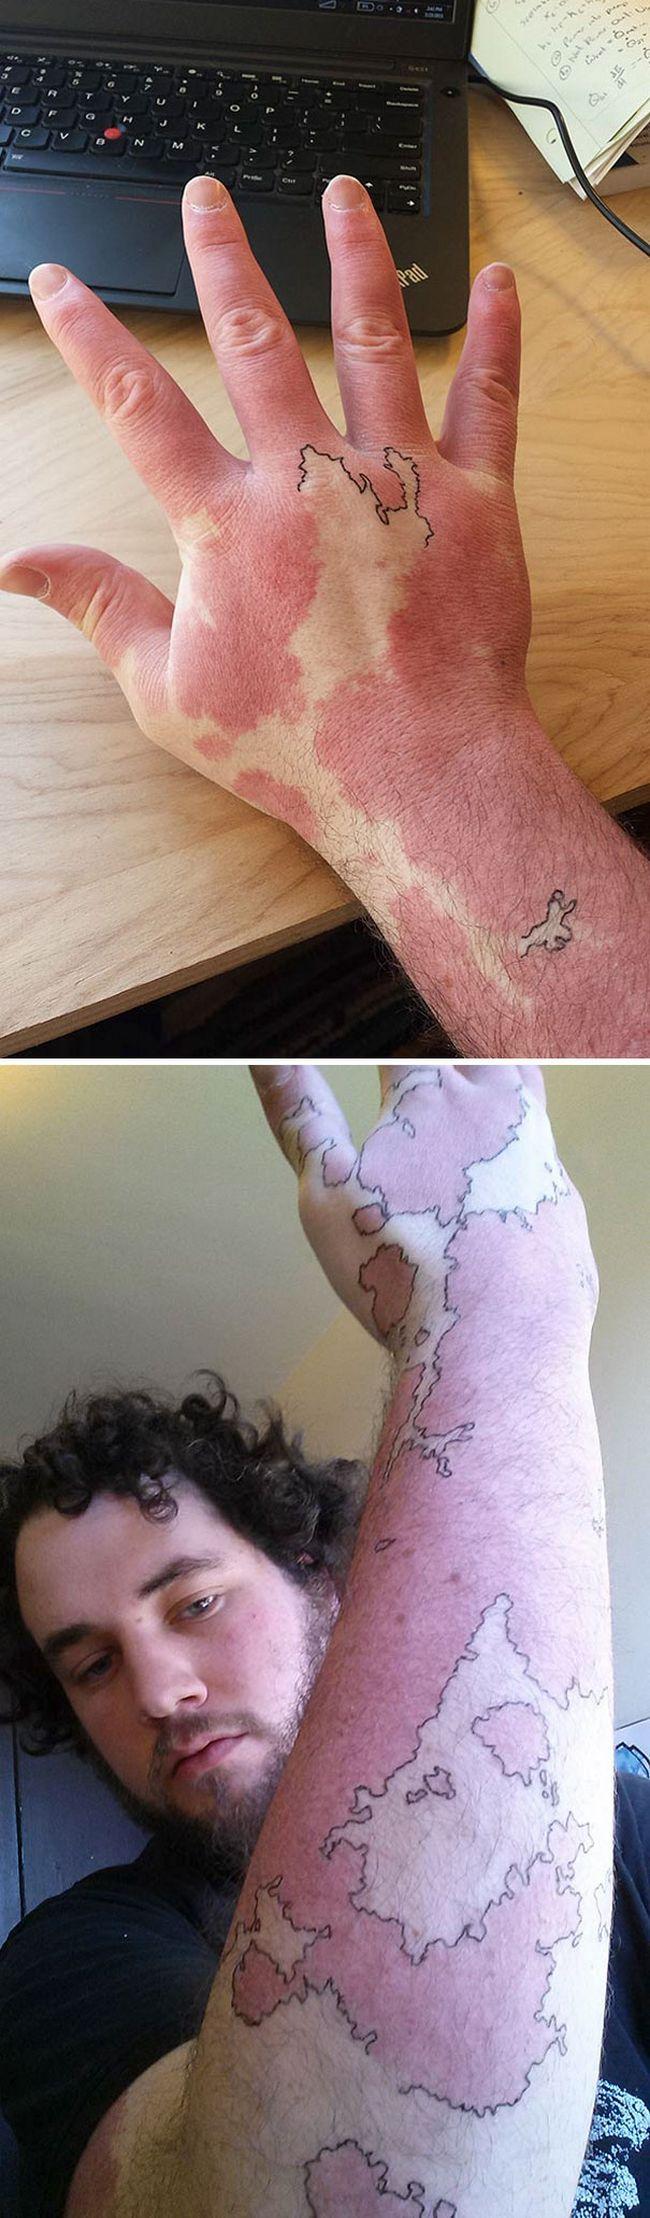 marcas-cobertas-tattoo-3